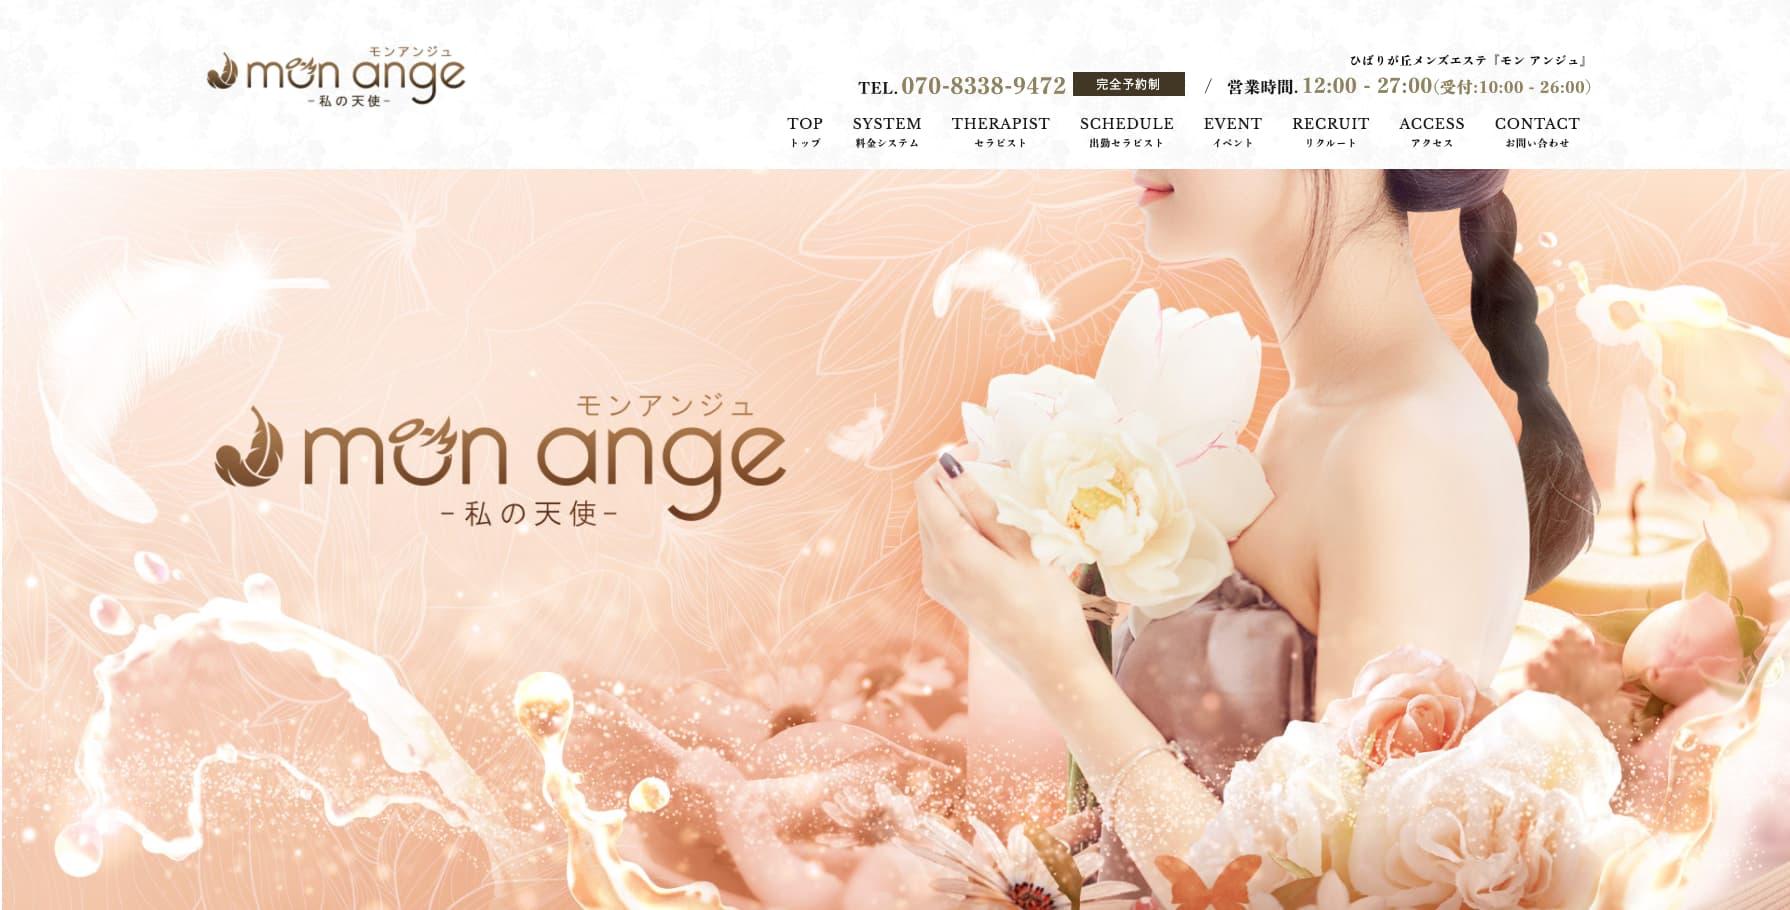 mon ange(モン・アンジュ)